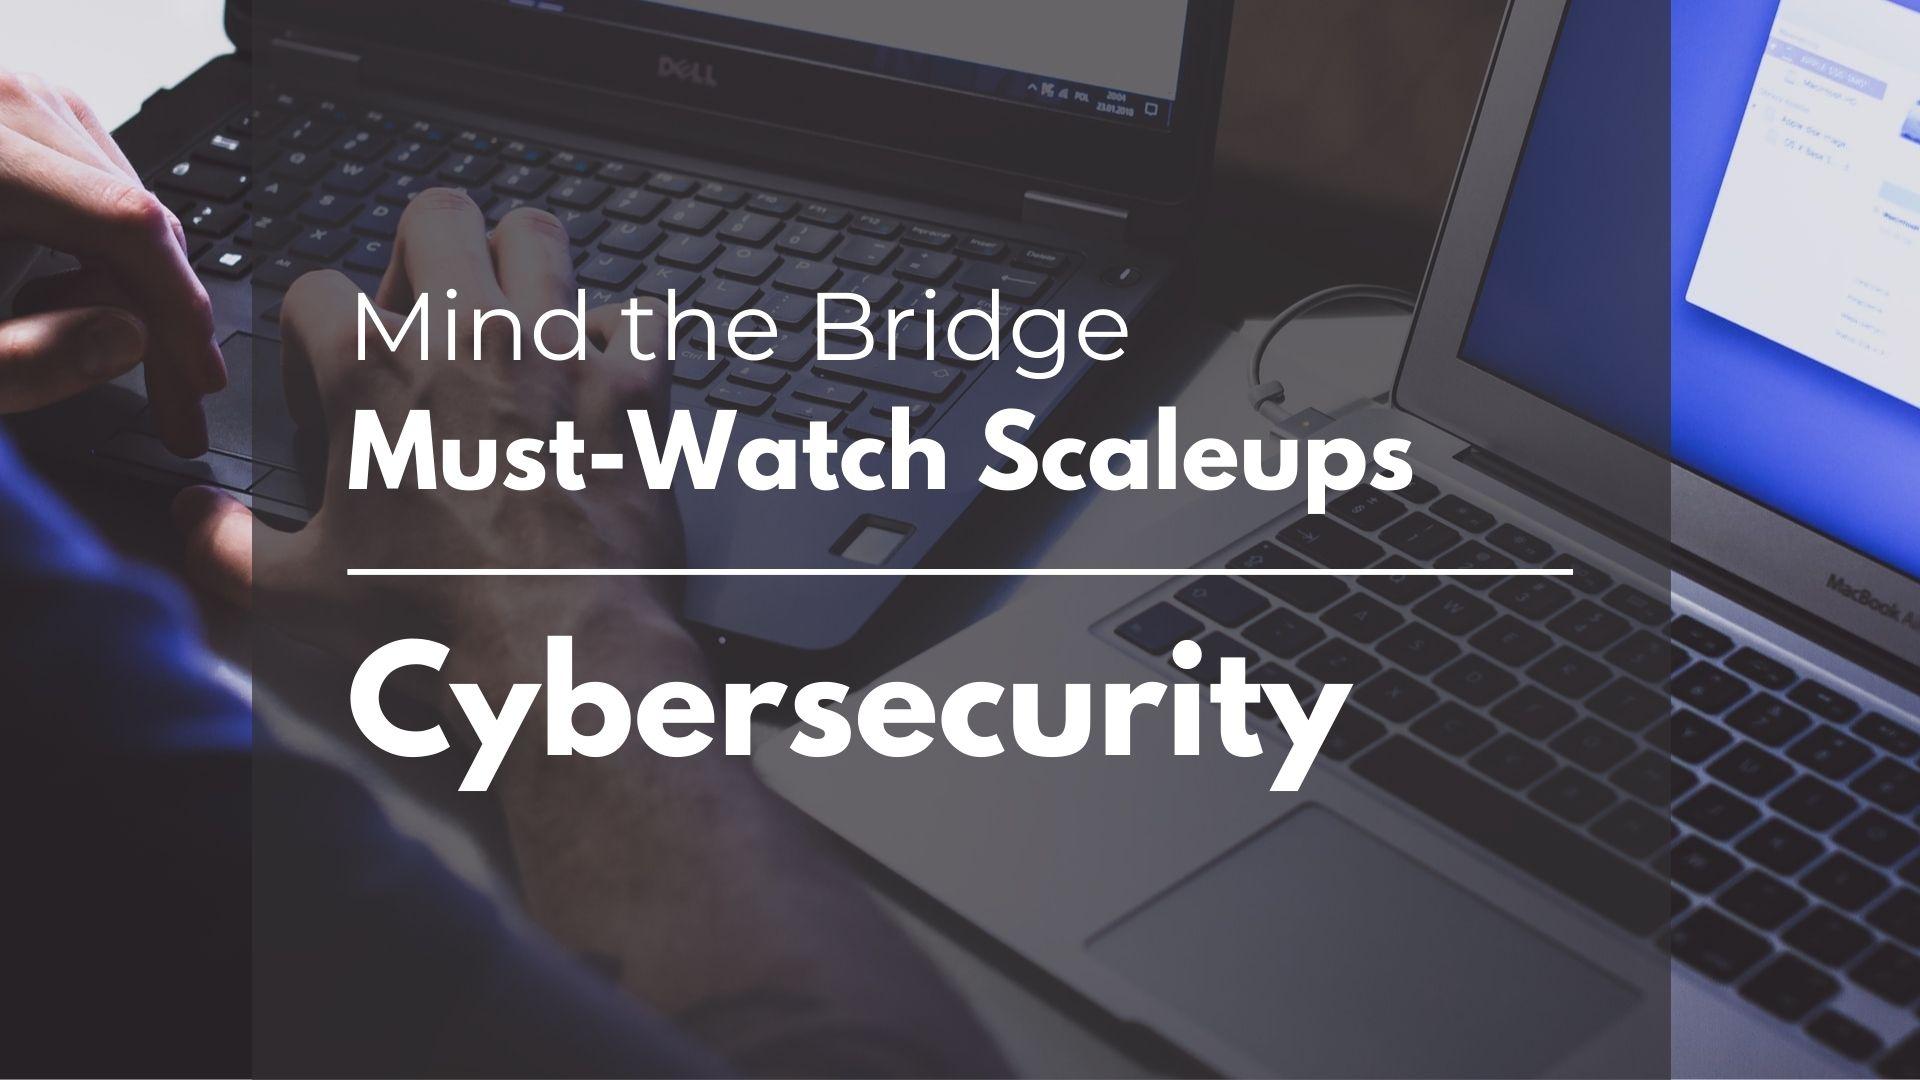 MTB's Must-Watch EU Scaleup list - Cybersecurity